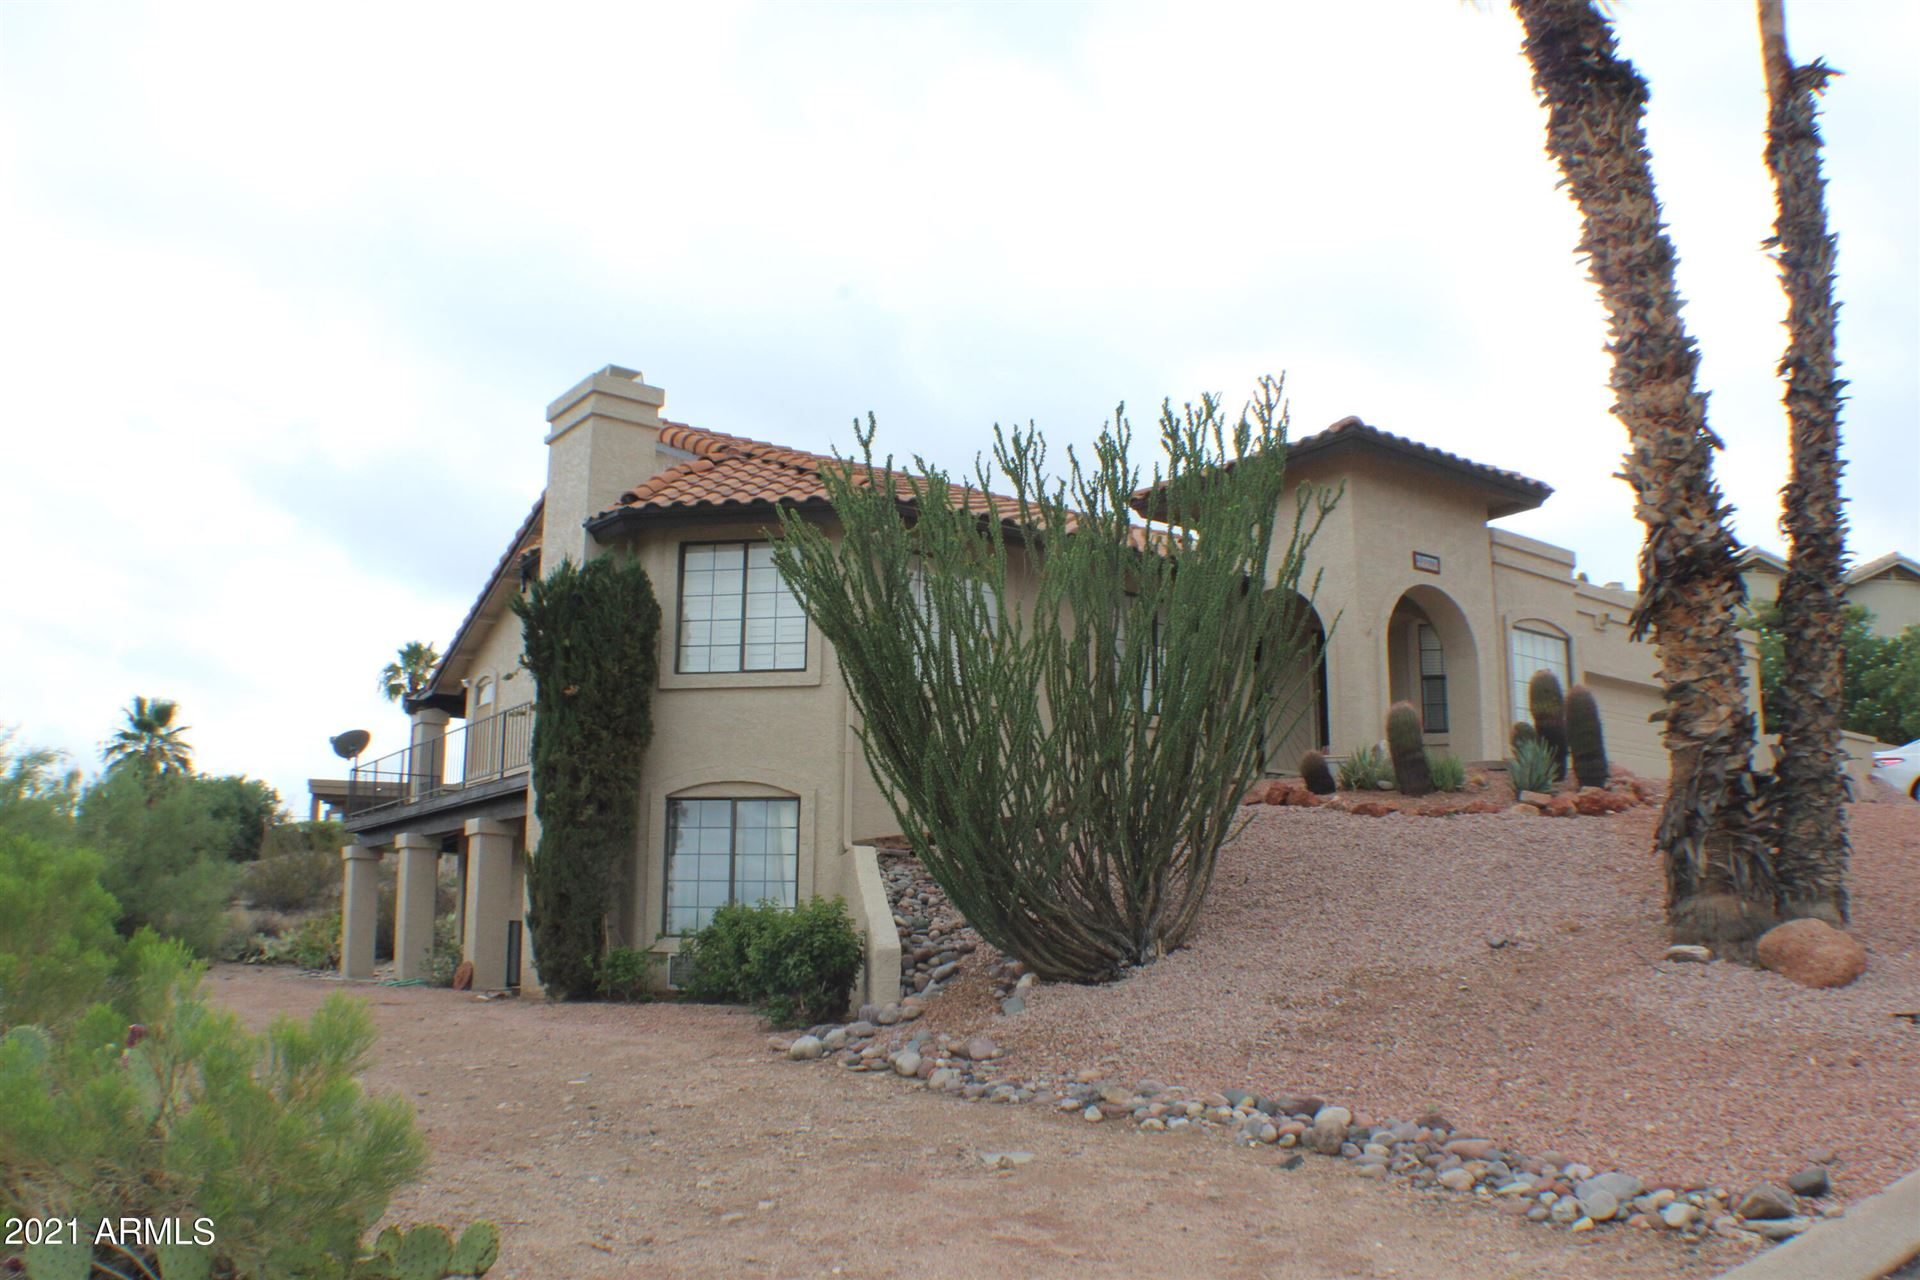 Photo of 17031 E LEMA Circle, Fountain Hills, AZ 85268 (MLS # 6269662)